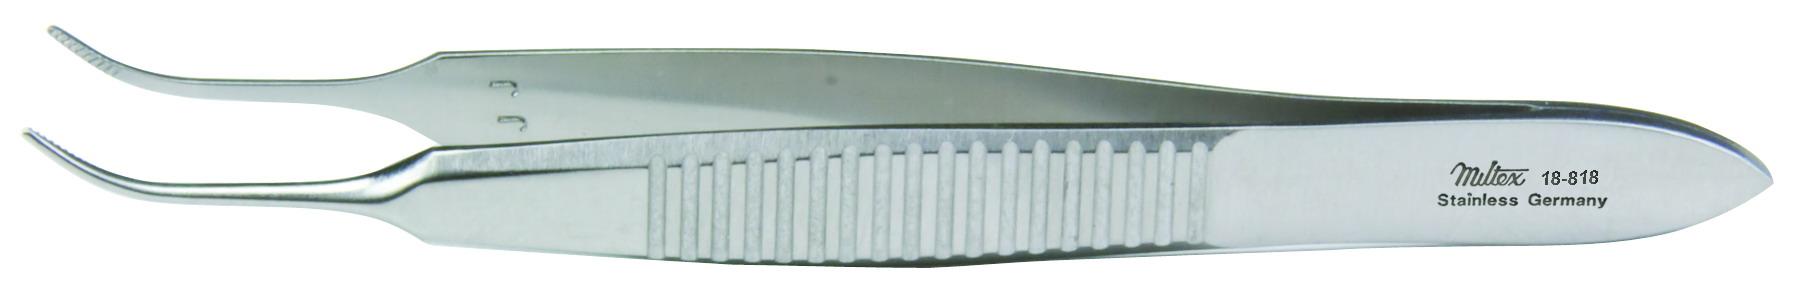 graefe-eye-dressing-forceps-2-3-4-7-cm-curved-serrated-18-818-miltex.jpg